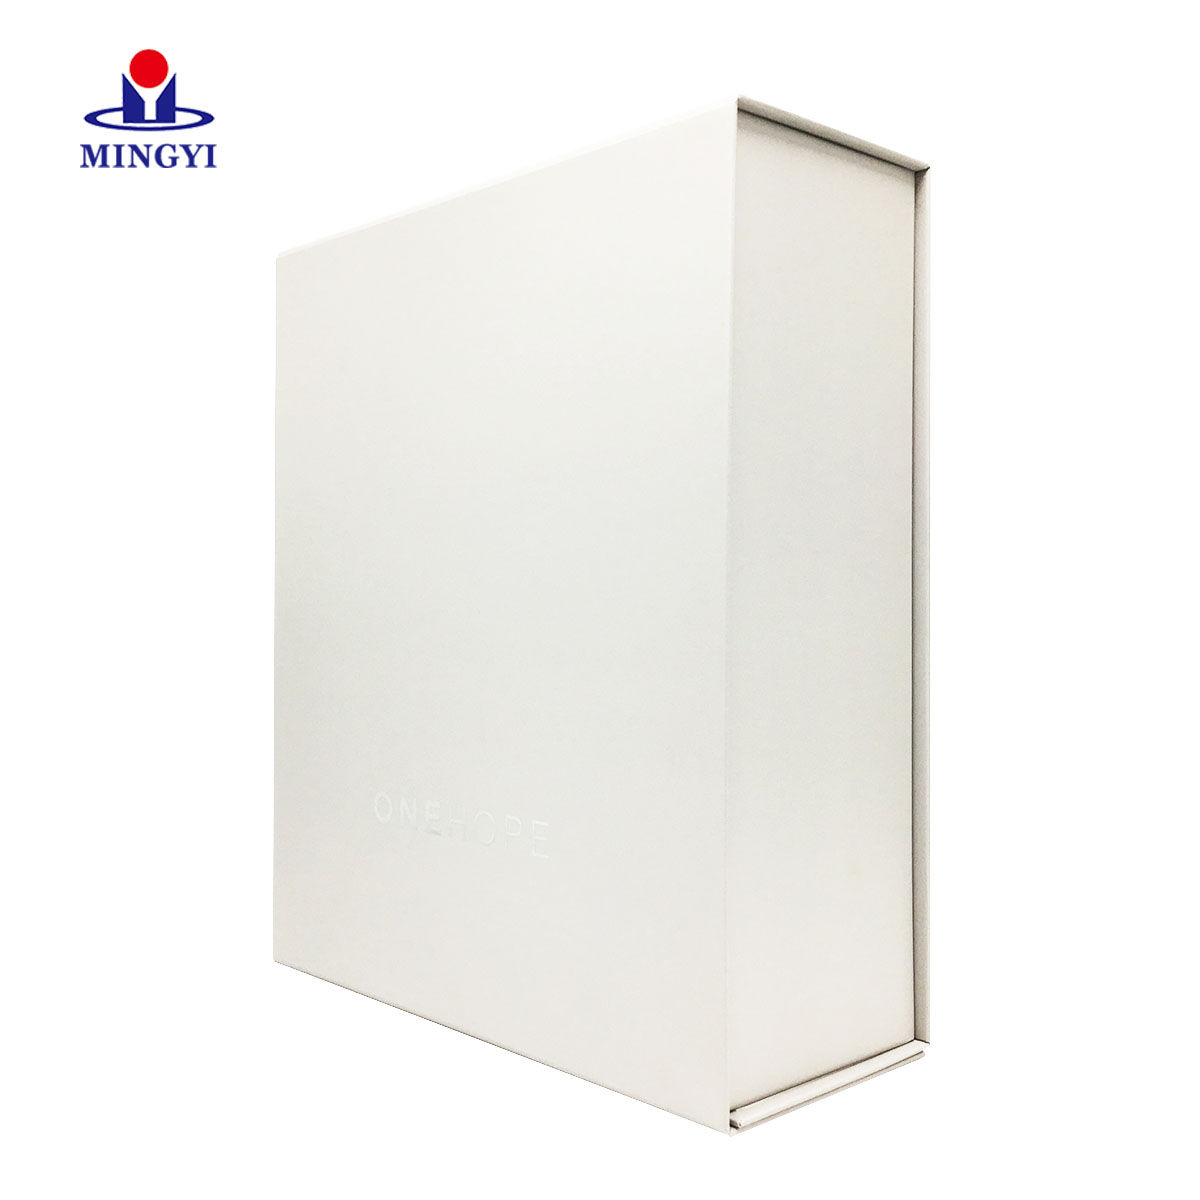 product-Customized electronic packaging boxes custom logo-Mingyi Printing-img